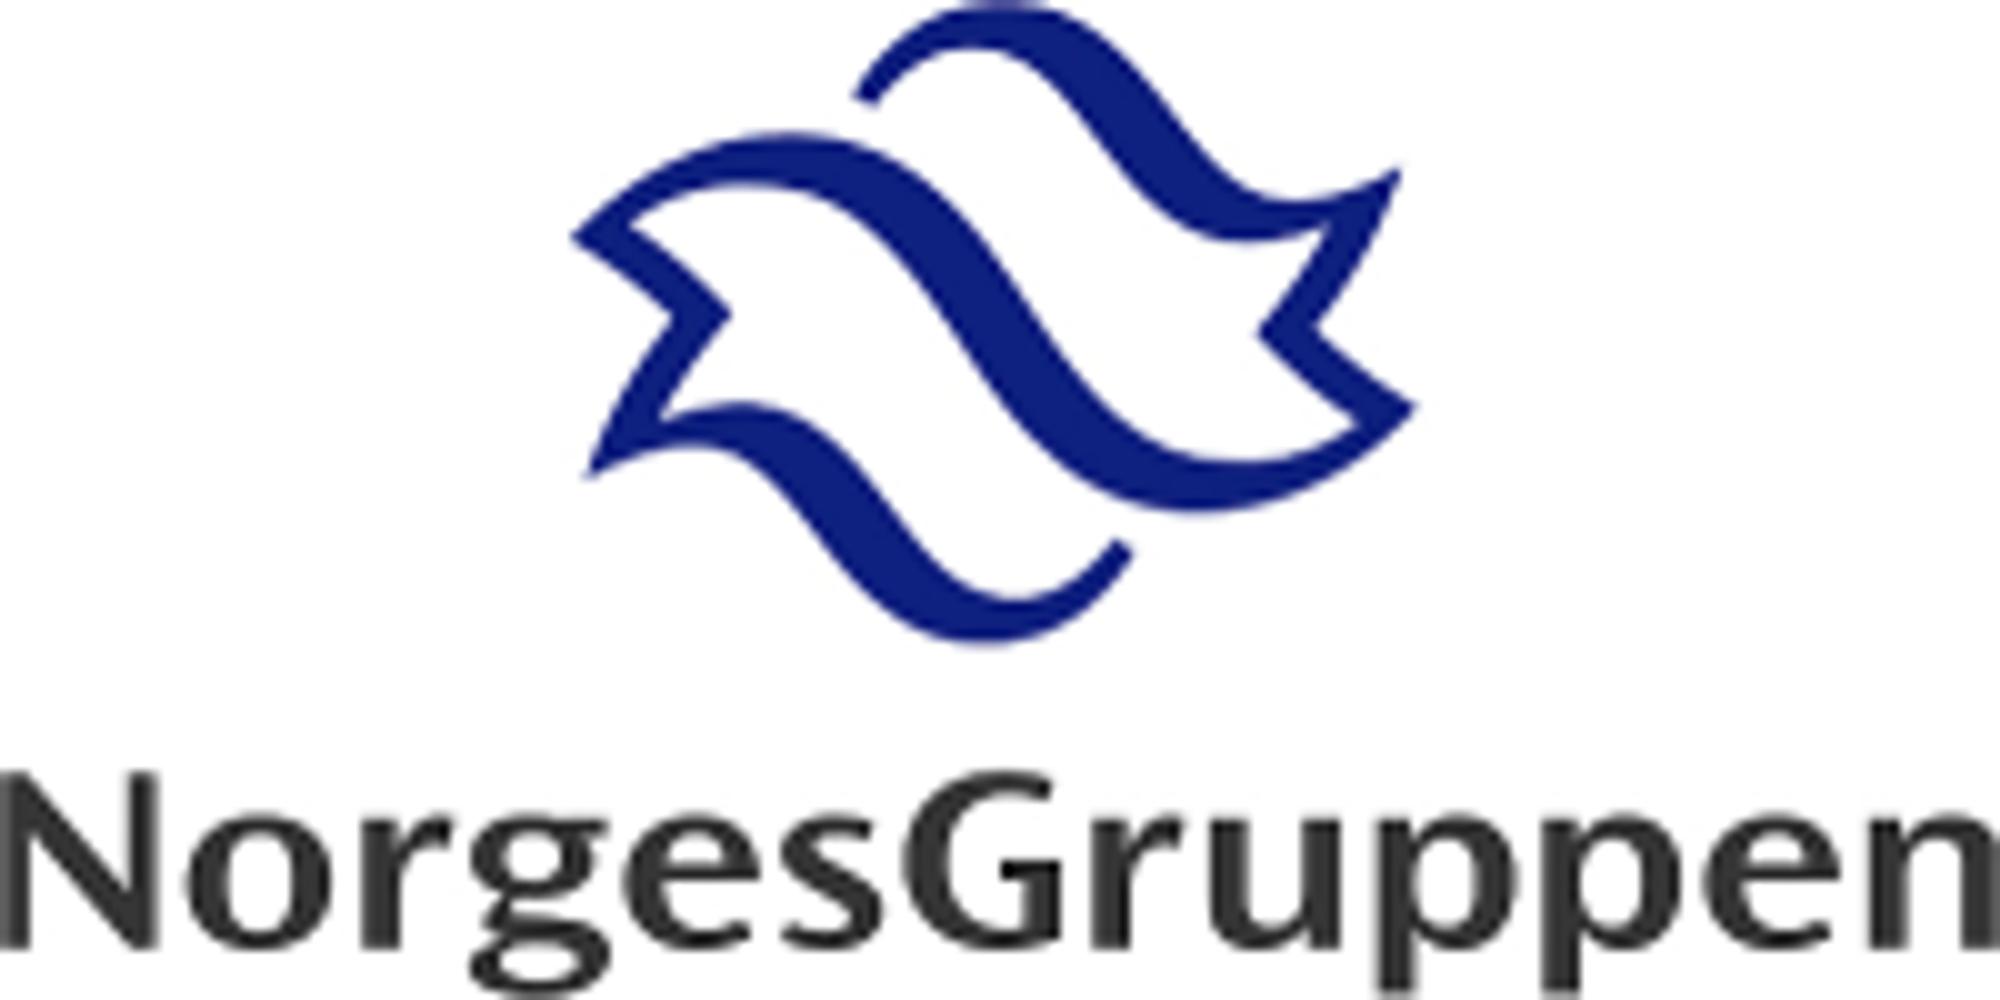 NorgesGruppen Data AS